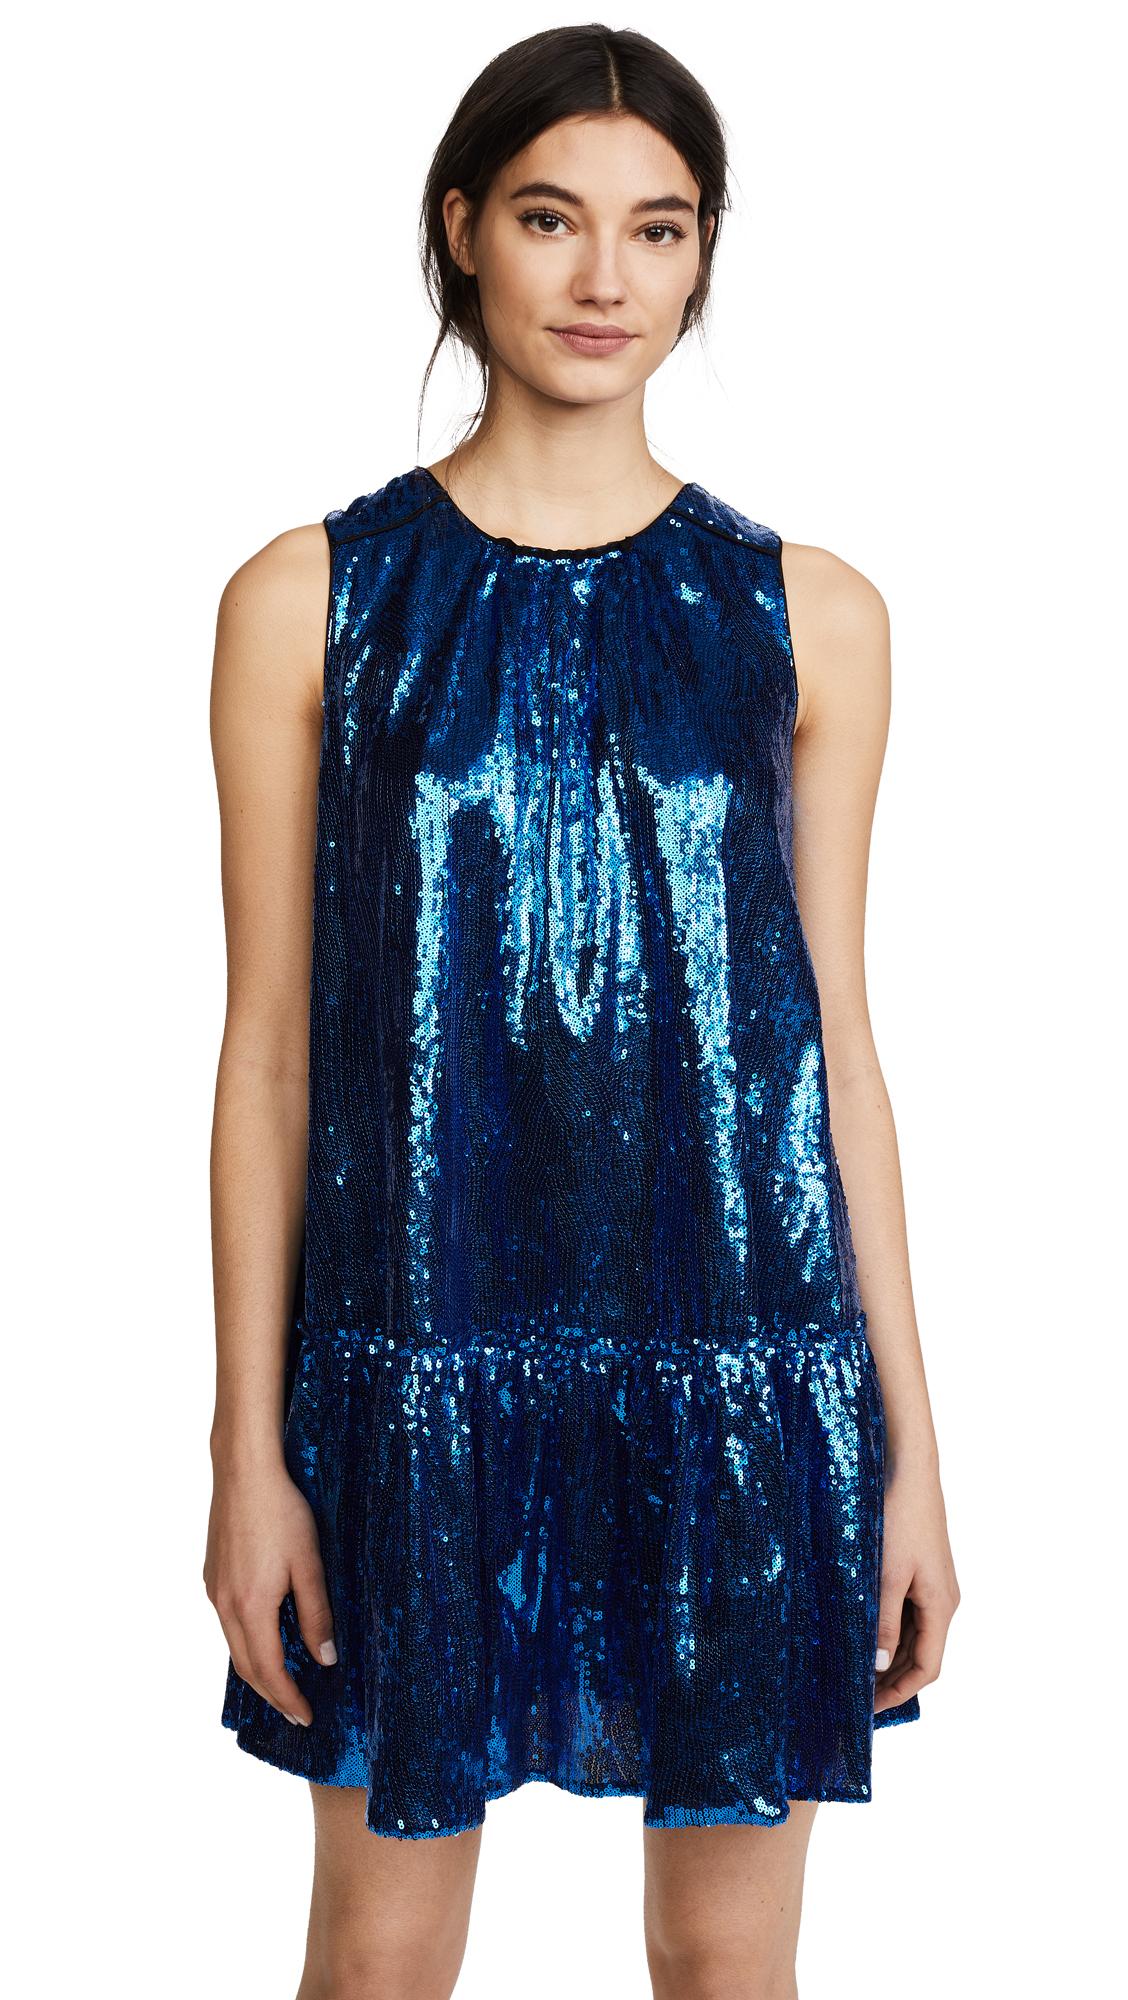 No. 21 Sleeveless Mini Dress In Blue